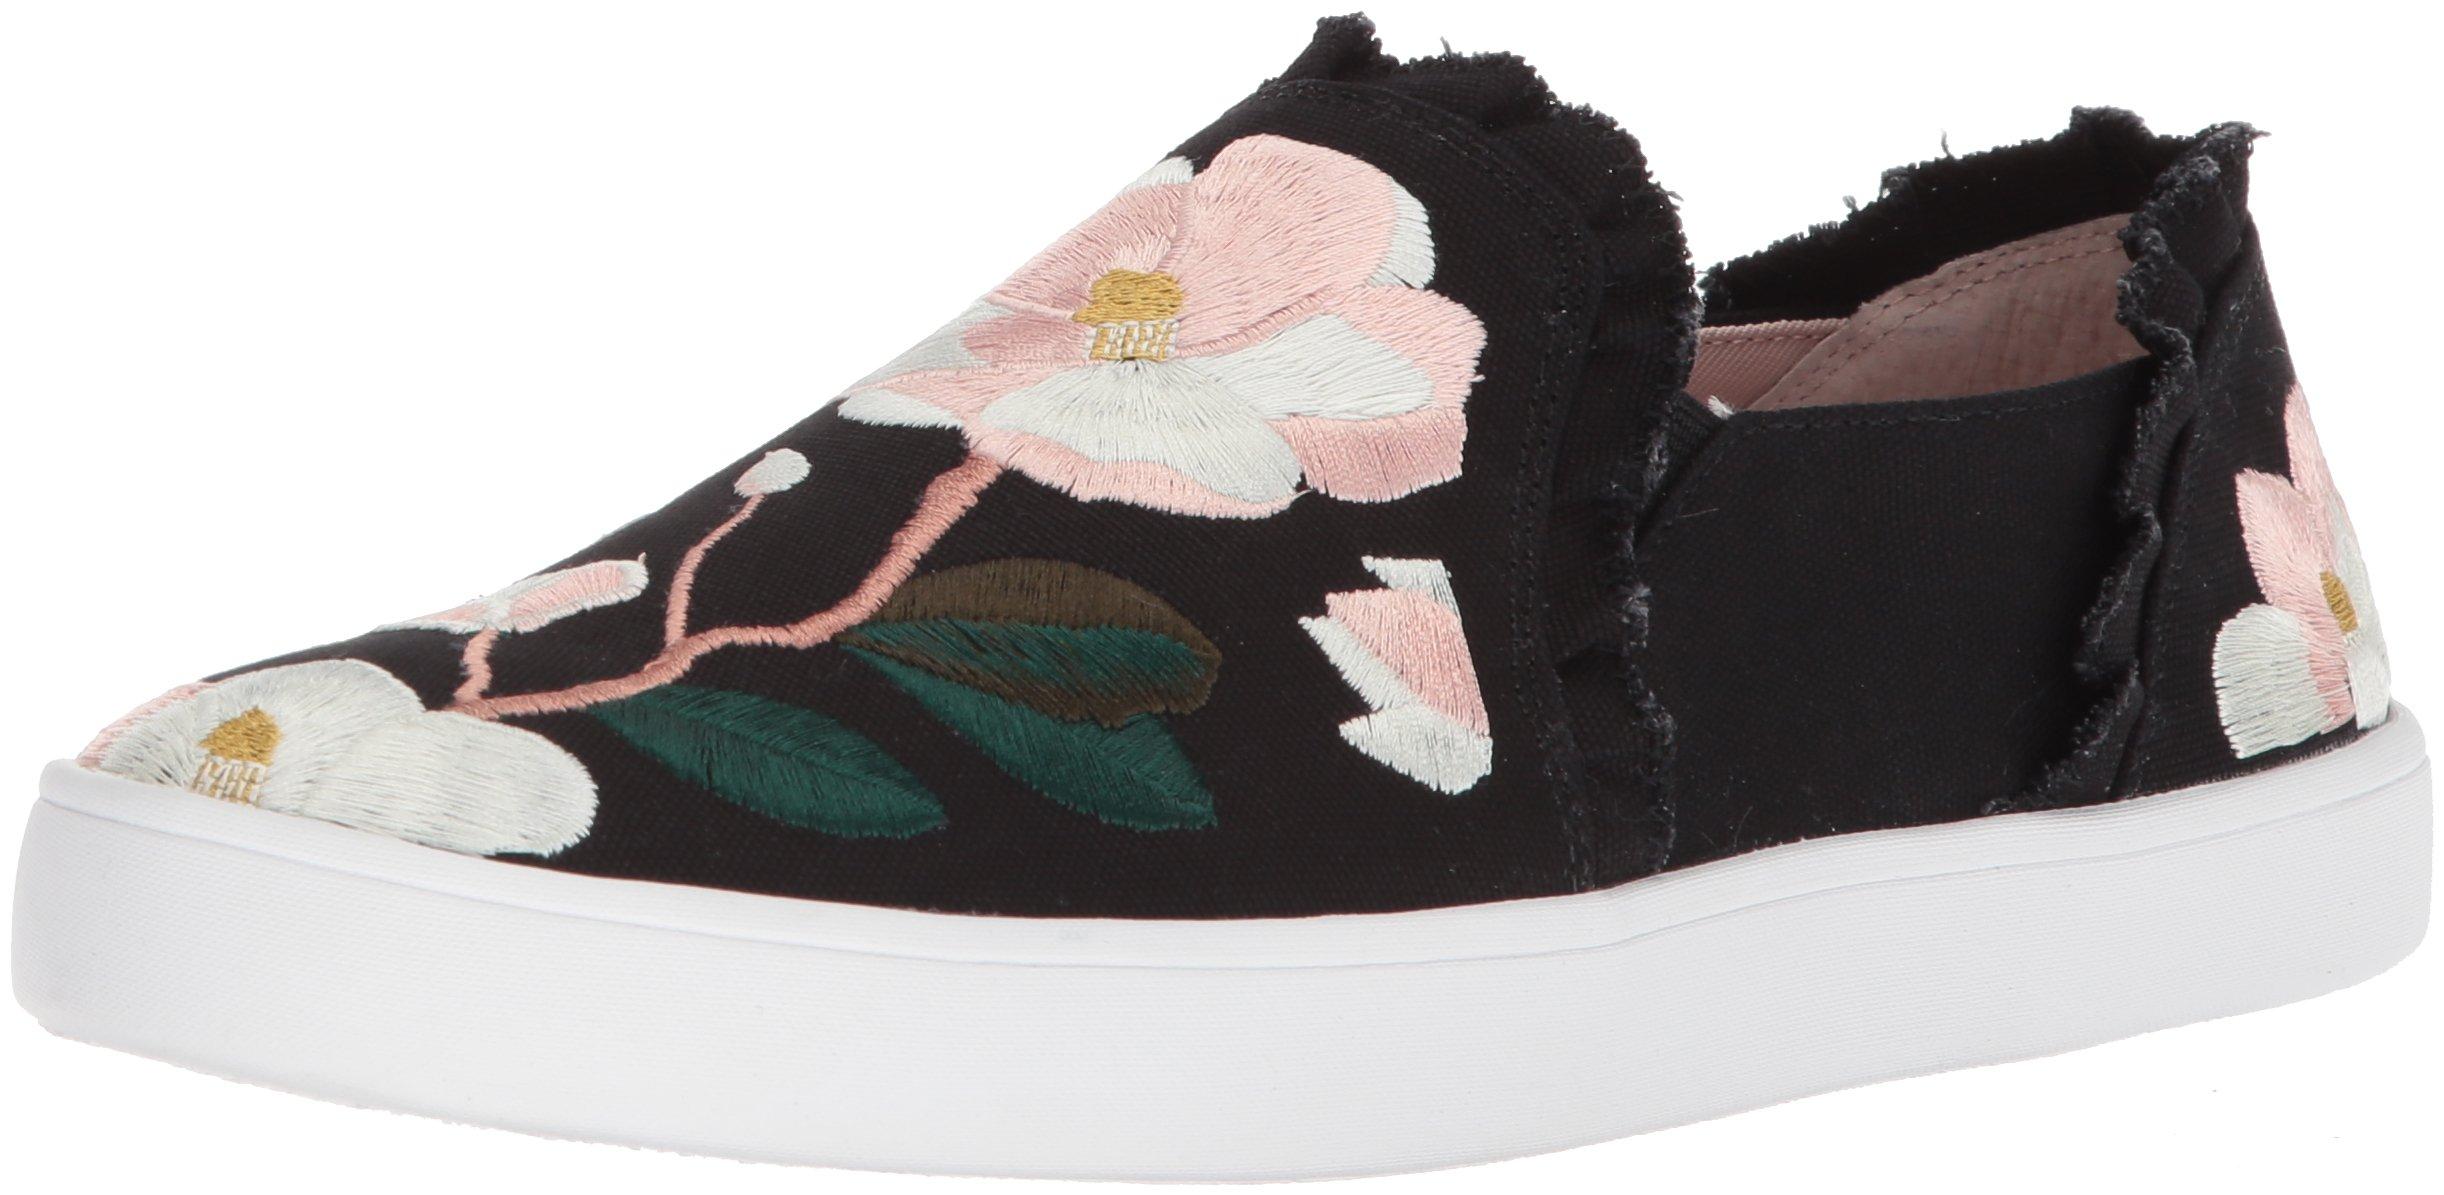 Kate Spade New York Women's Leonie Sneaker, Black Linen, 7.5 Medium US by Kate Spade New York